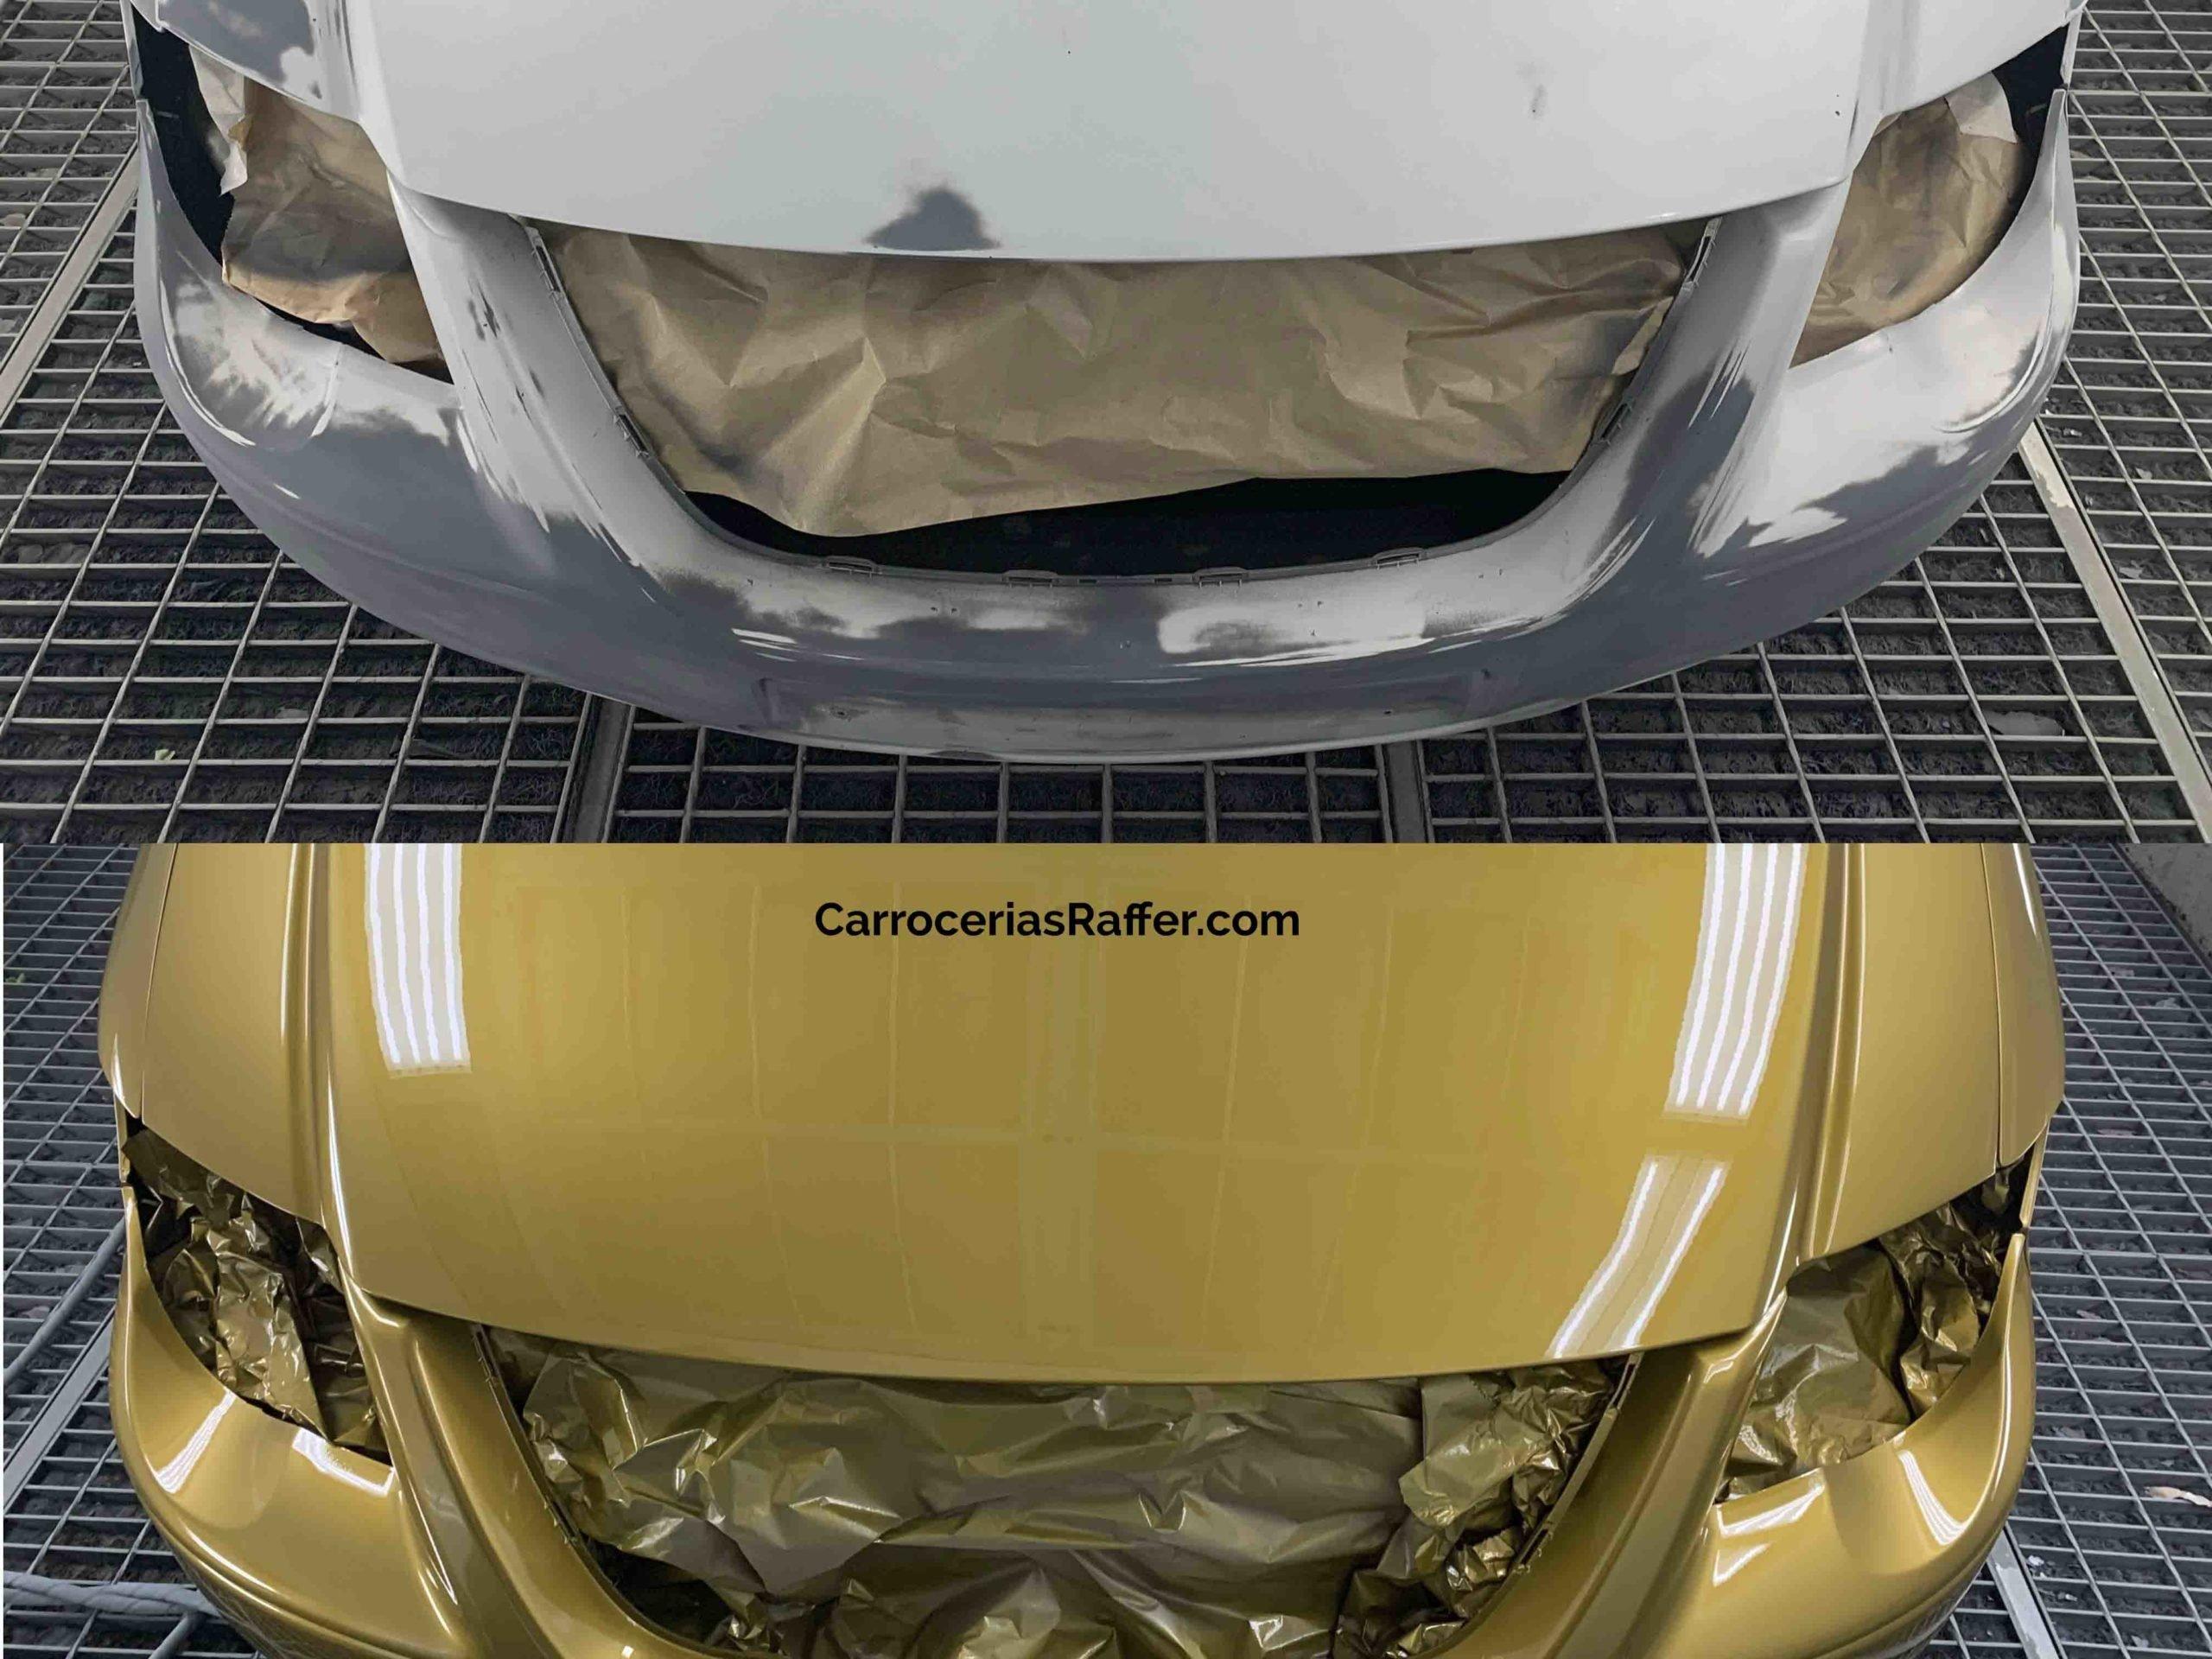 00001 chrysler voyager amarillo curcuma carrocerias raffer pintar furgoneta hernani gipuzkoa donostia san sebastian